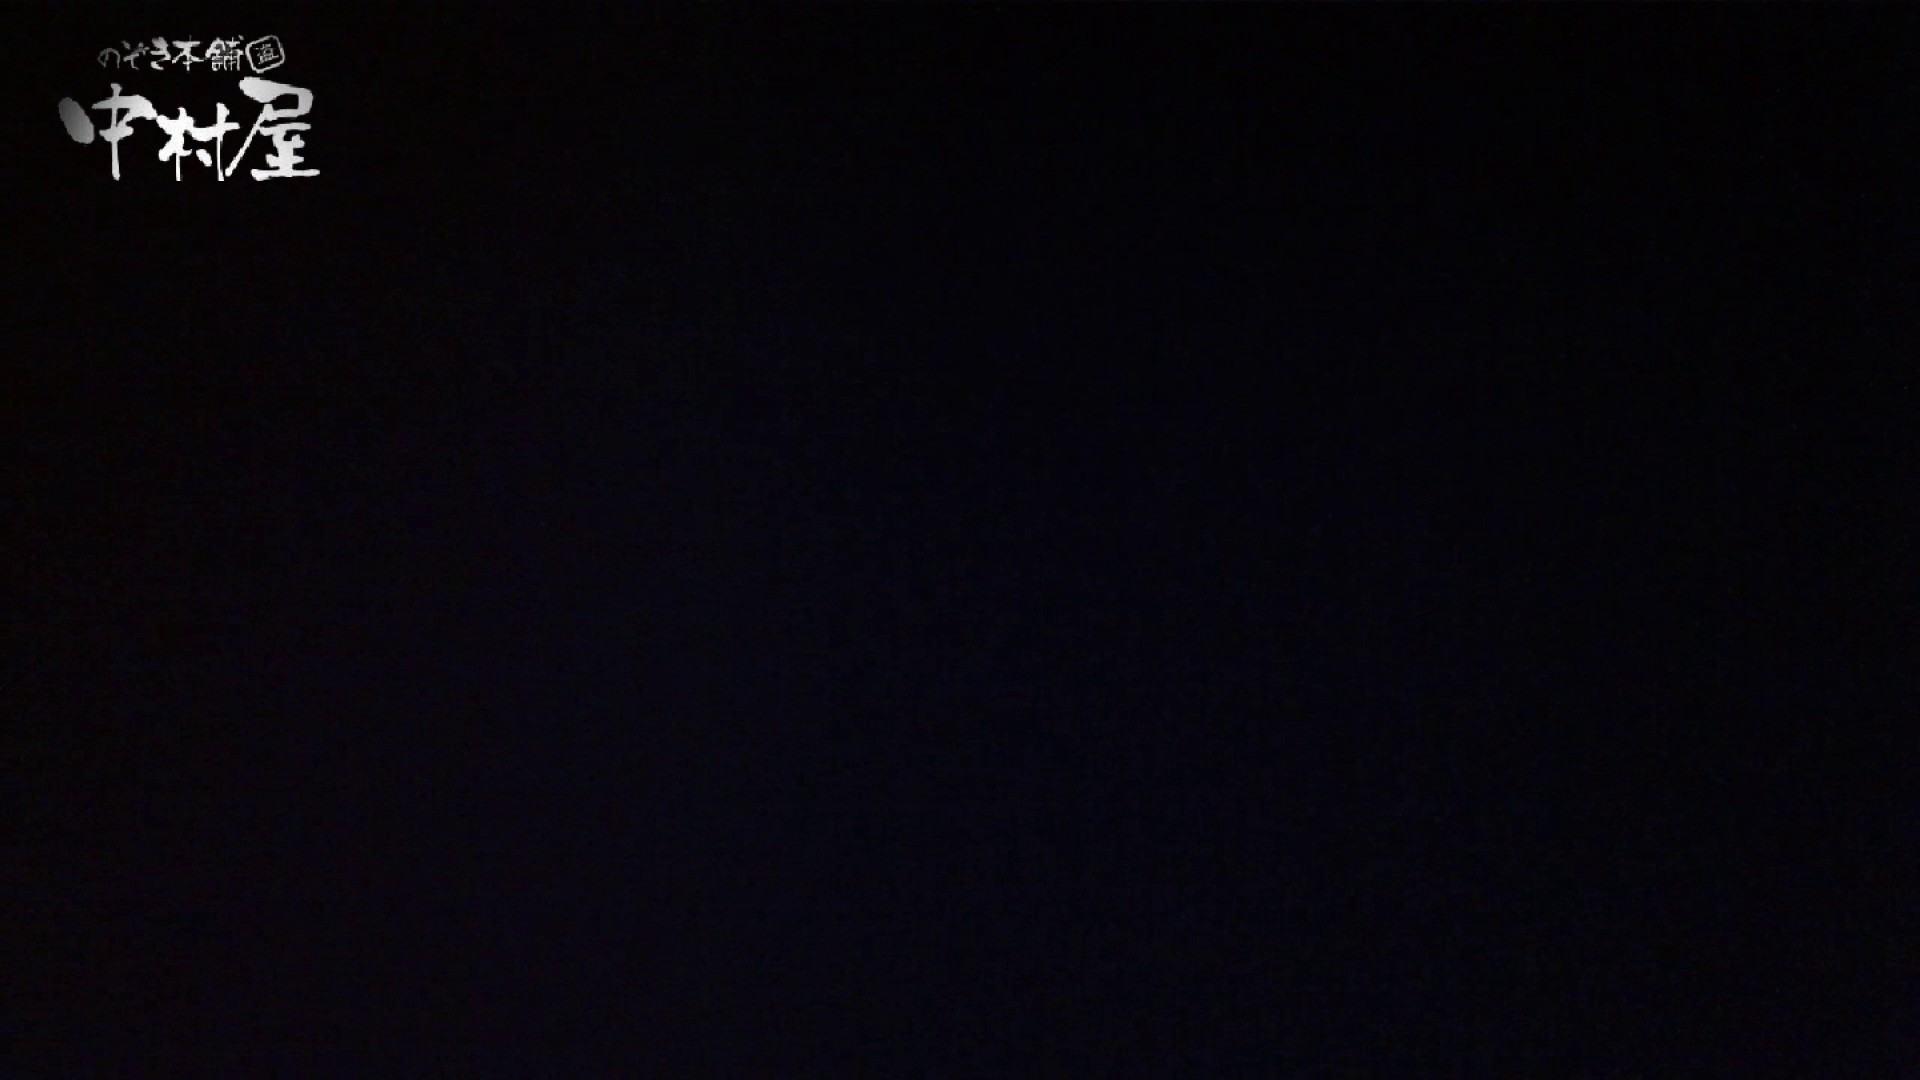 vol.47 カリスマ店員胸チラ&パンチラ 黒パン店員さん パンチラ 盗み撮り動画 39連発 18